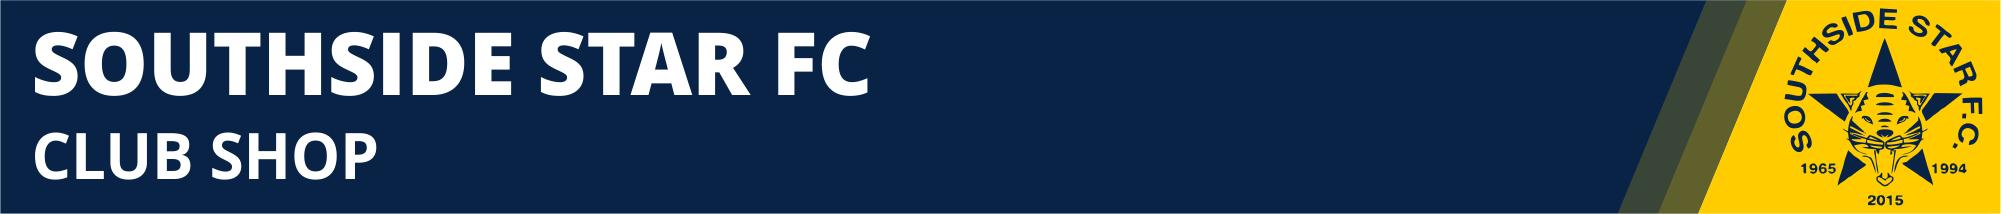 southside-star-fc-club-shop-banner.png